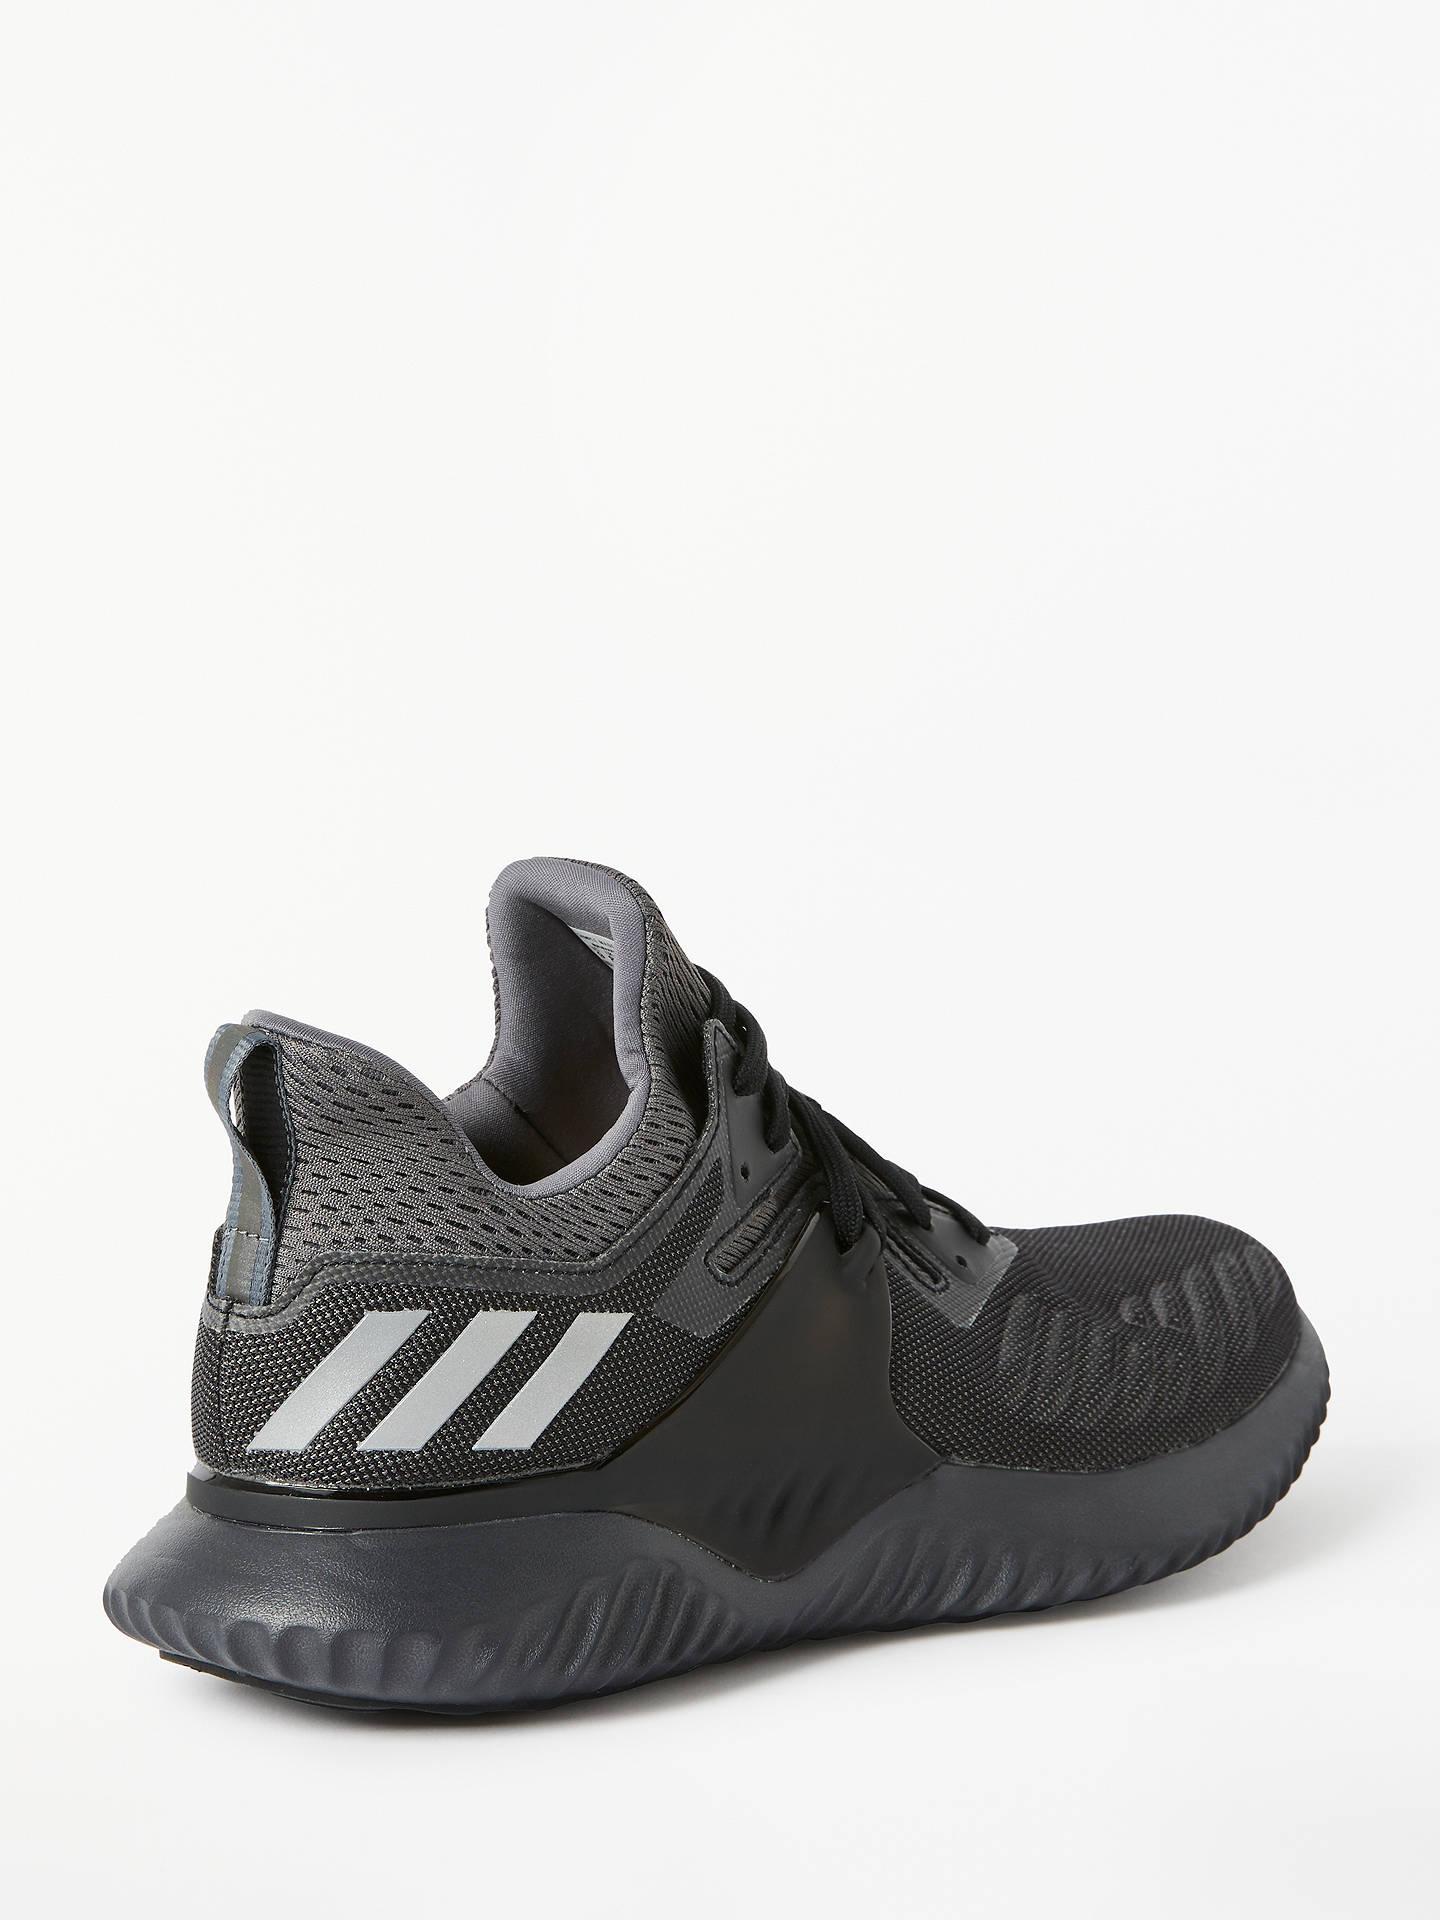 af73b2811 adidas Alphabounce Beyond 2.0 Men s Running Shoes at John Lewis ...